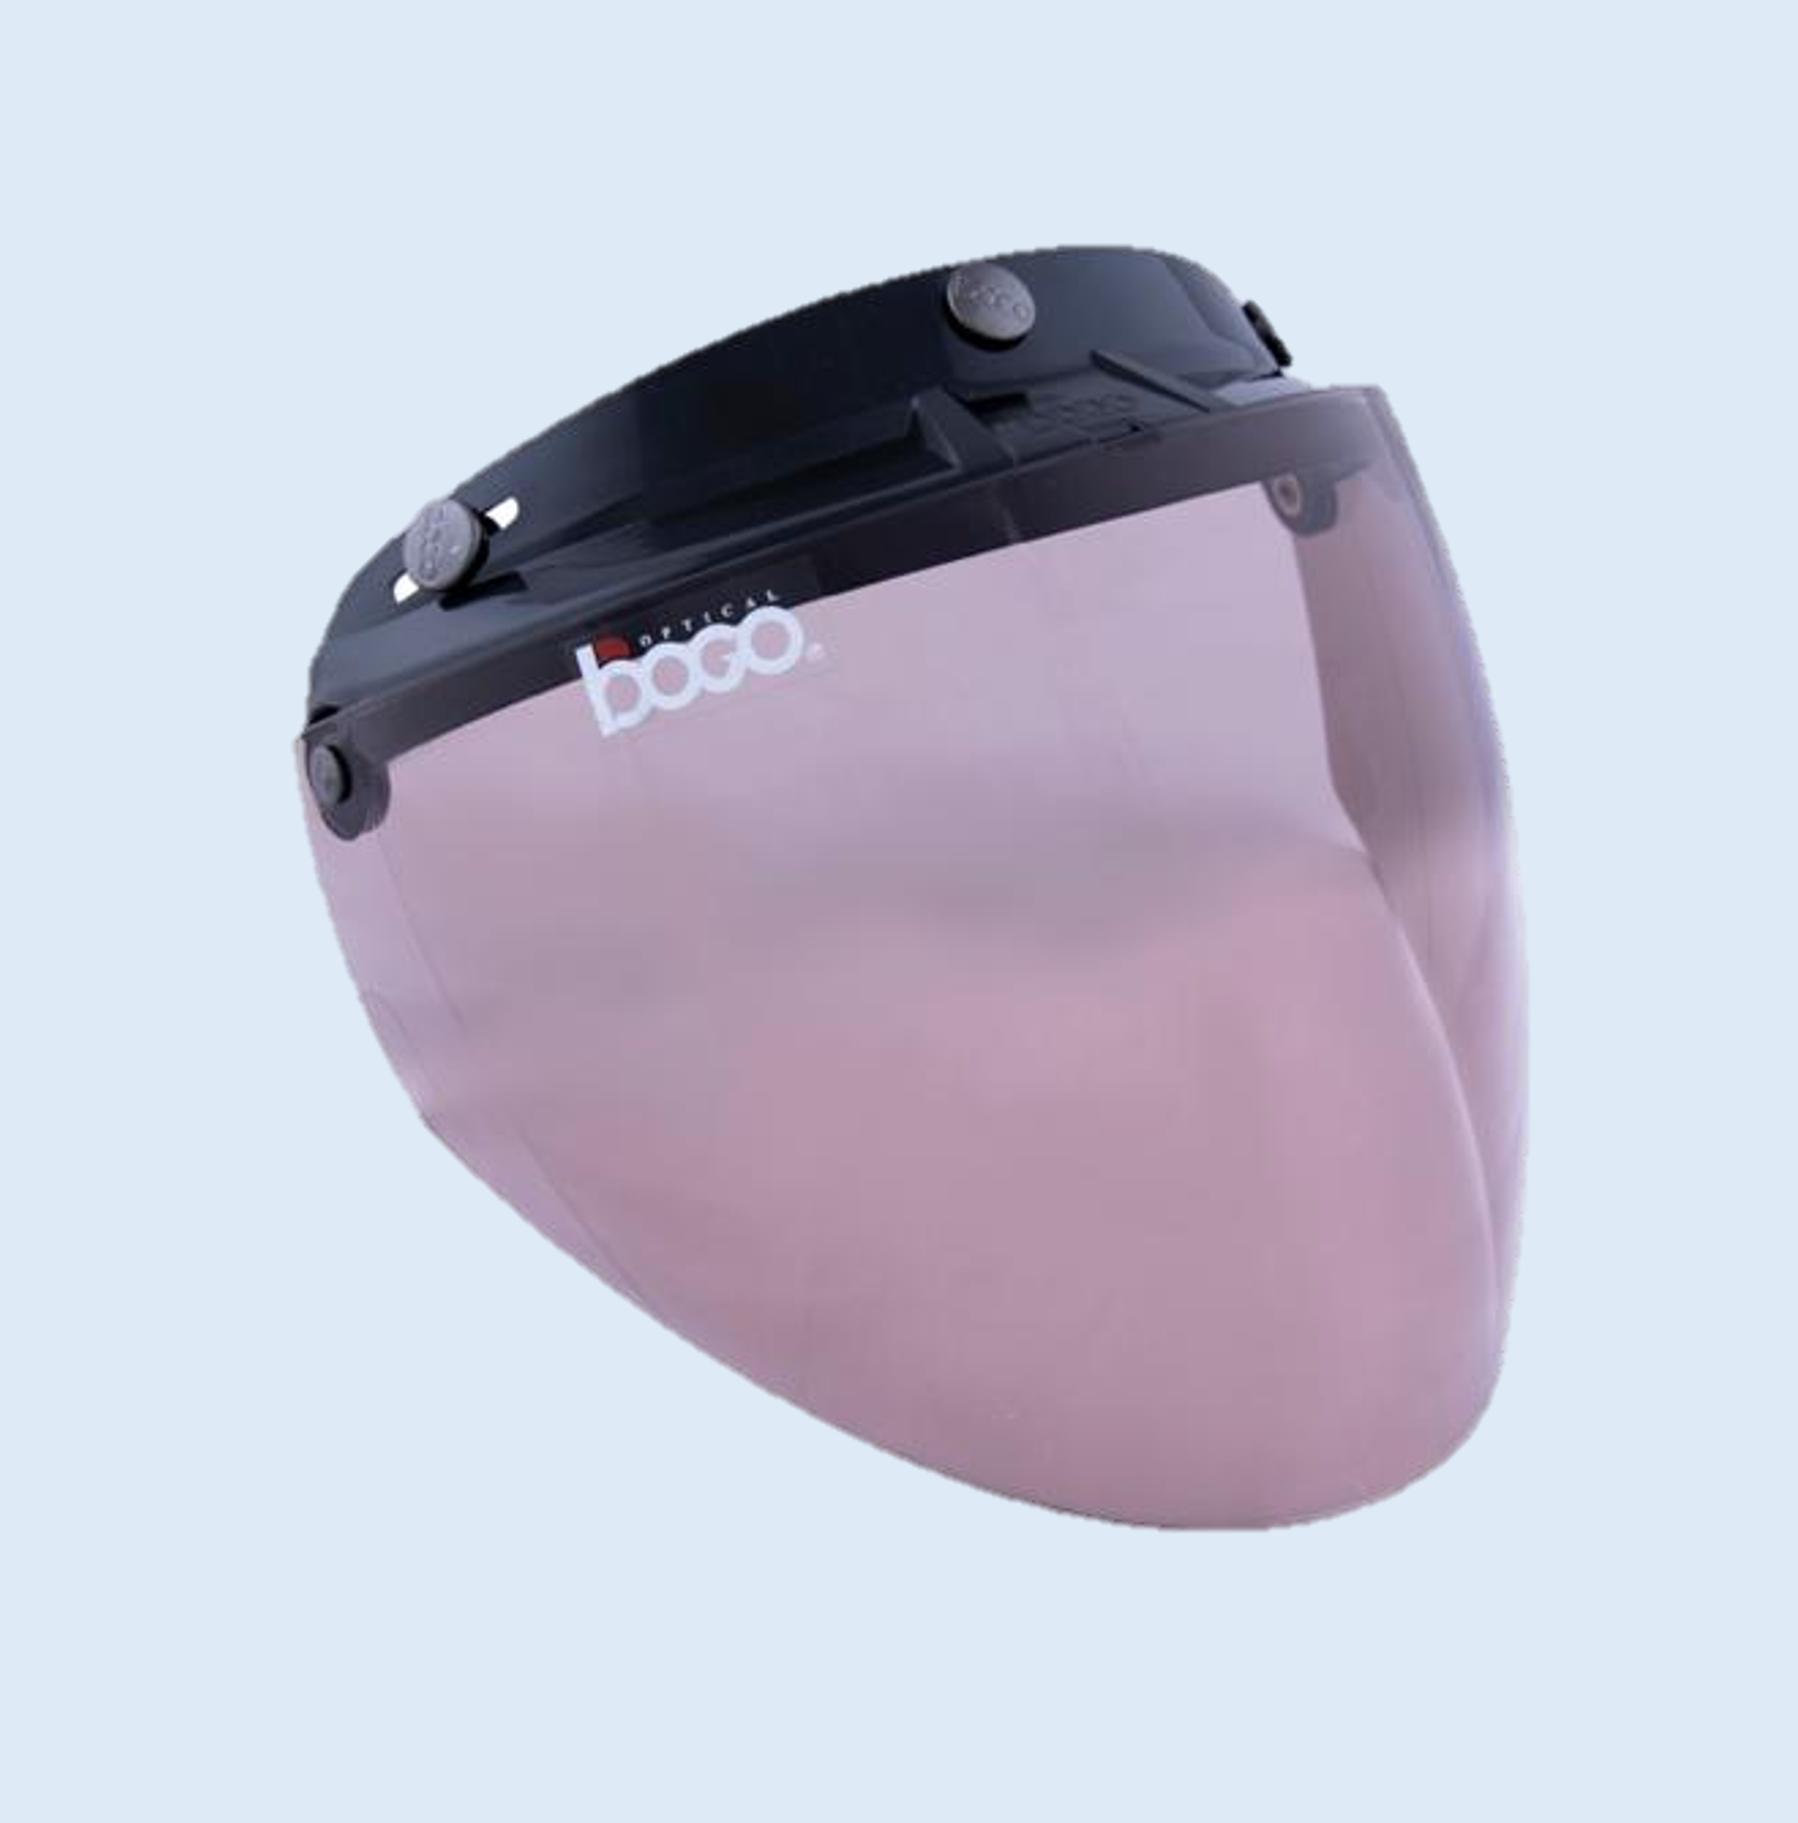 BOGO ジェットシールド フリップアップ 開閉式 ベース付き ブロンズ BG25-B1